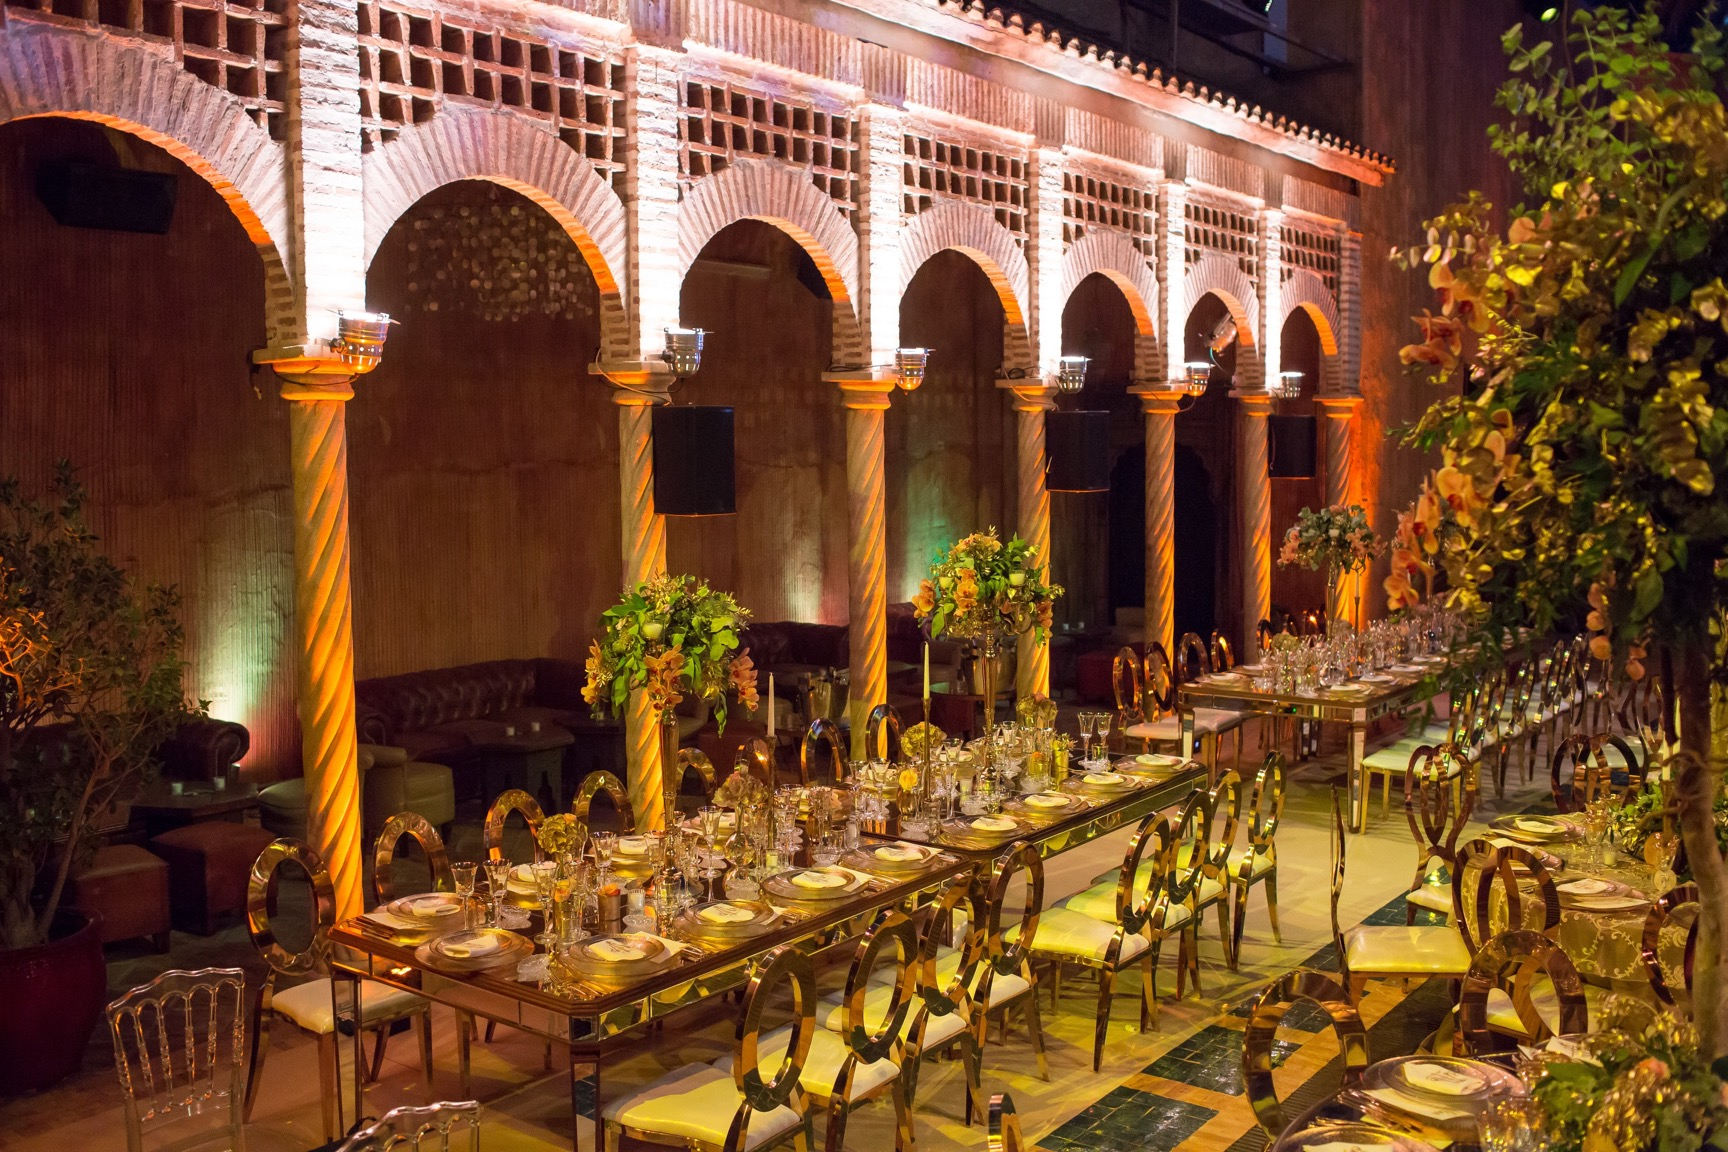 Si-Quiero-Wedding-Planner-By-Sira-Antequera-Bodas-Málaga-Marbella-Miami- L-A-36